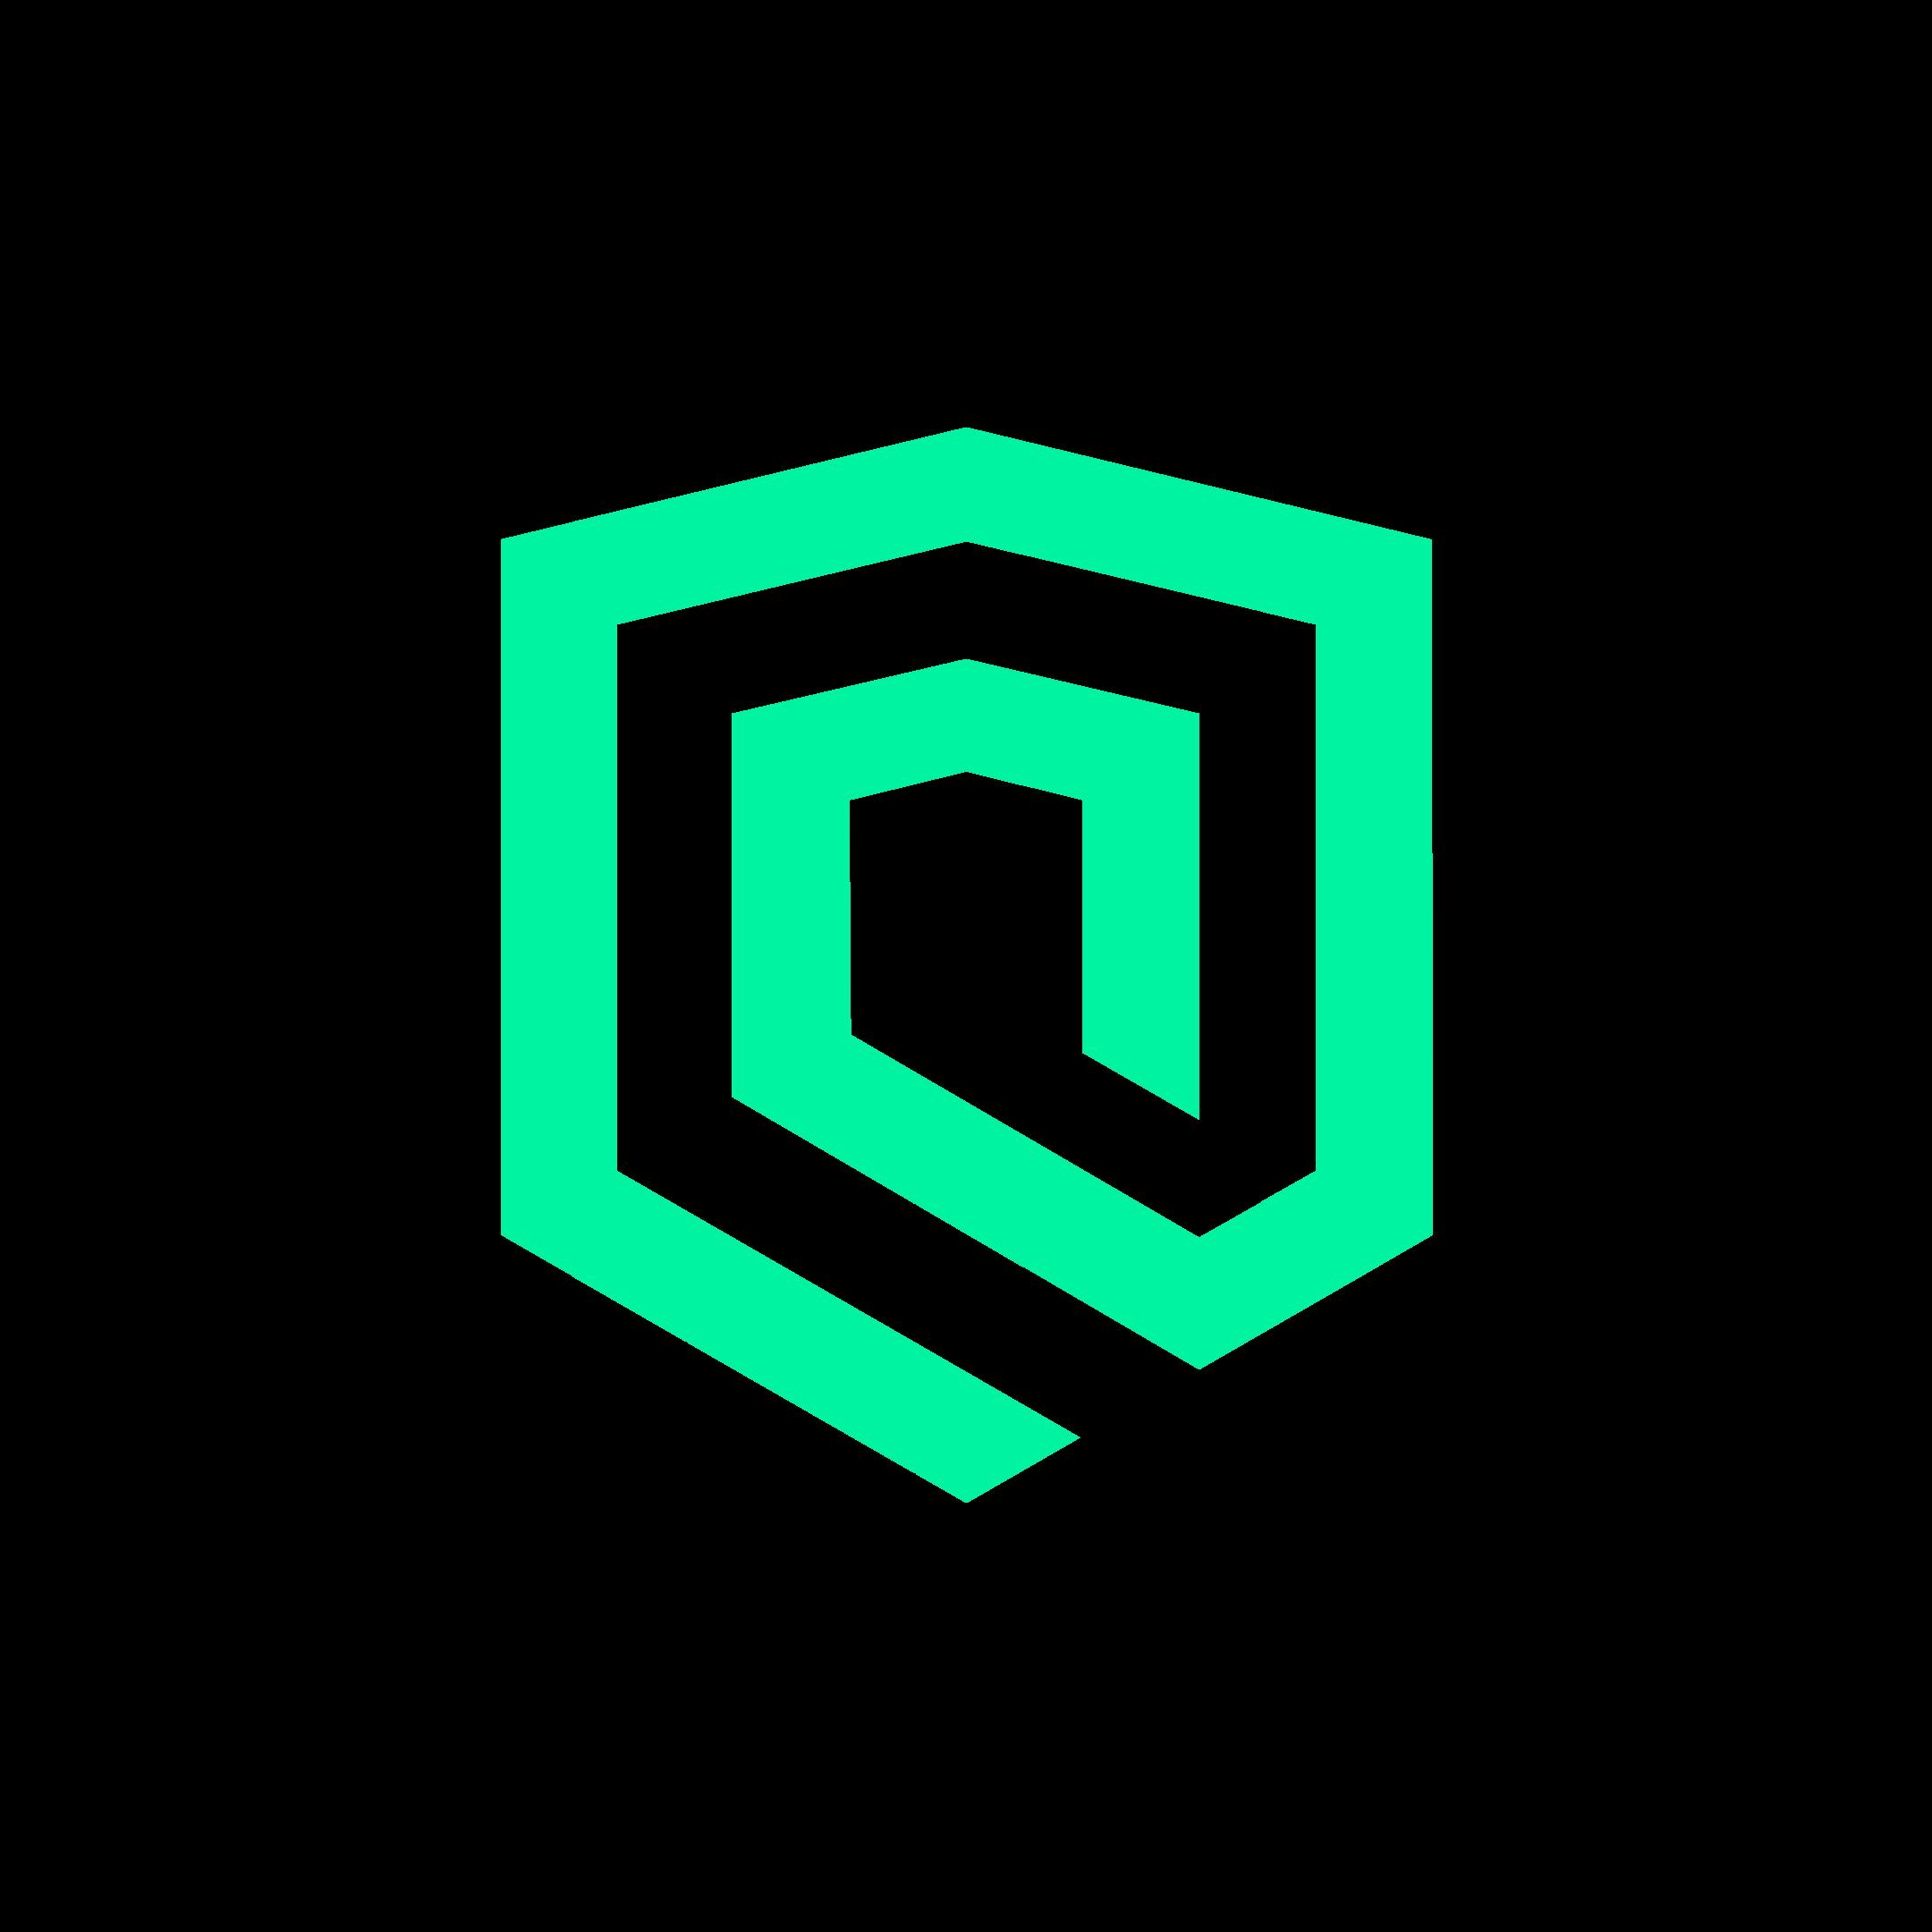 Proteqt logo